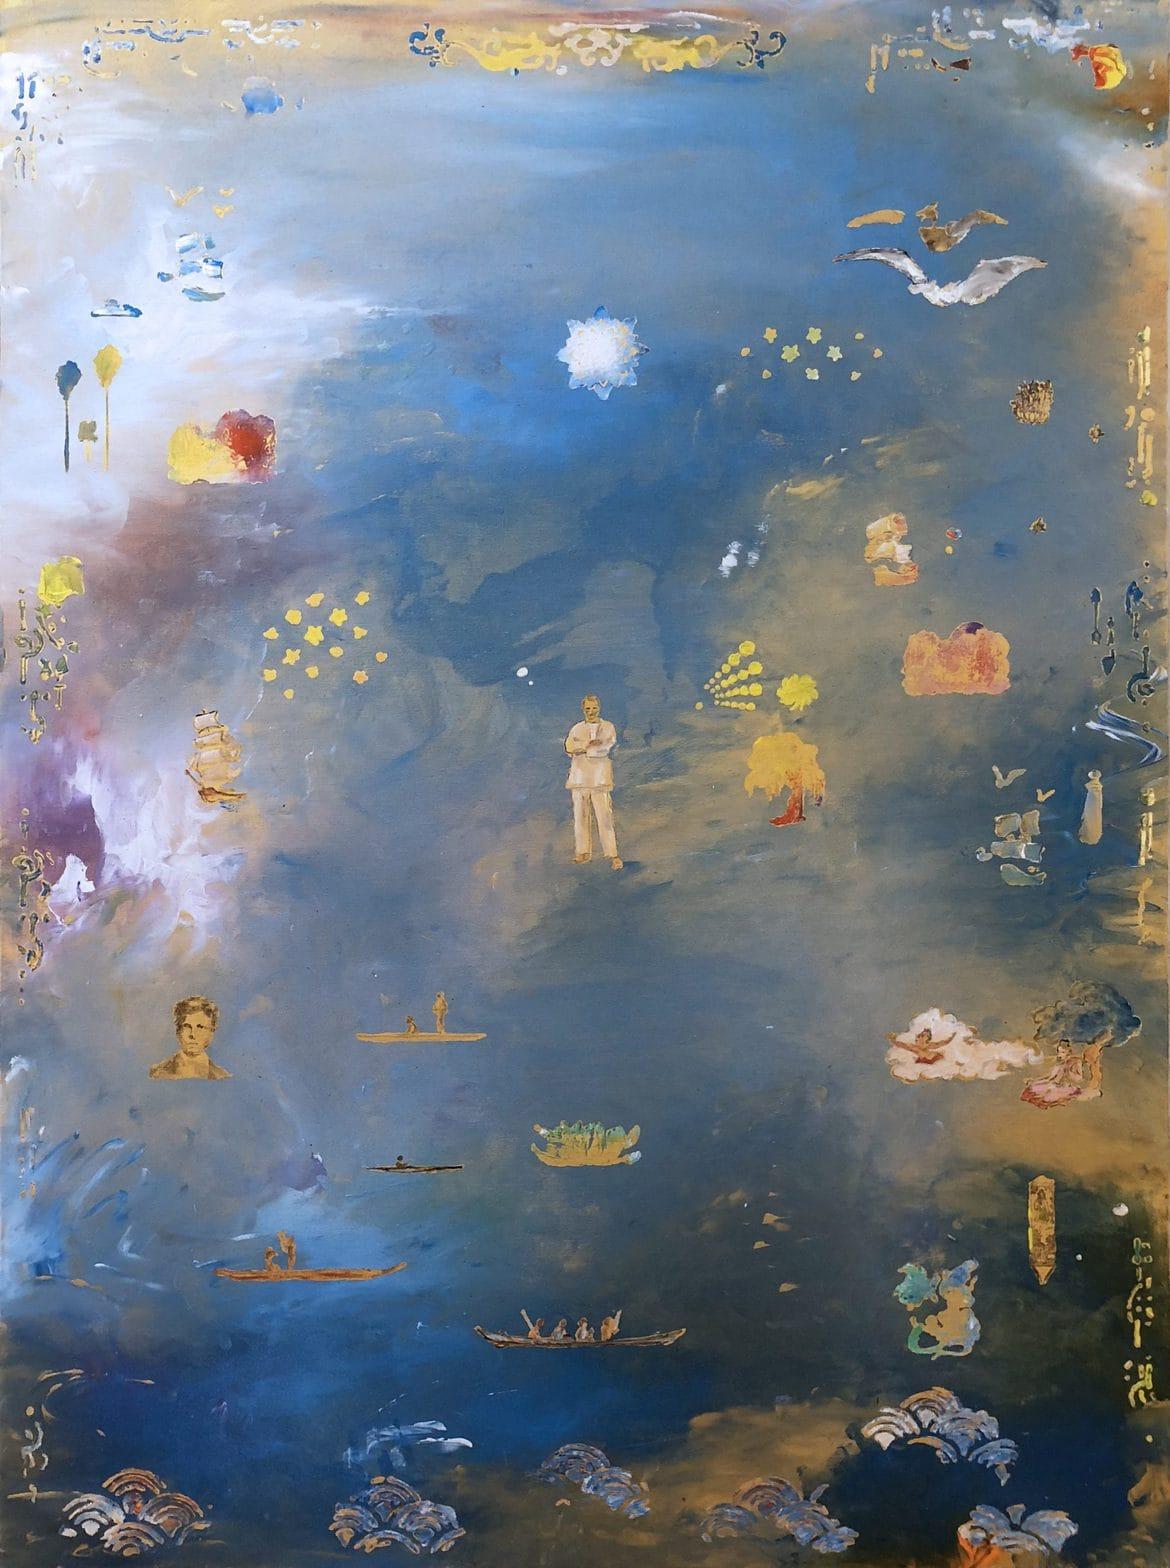 Tim Johnson, 'A.R.3', 2019, acrylic on linen, 137 x 102 cm